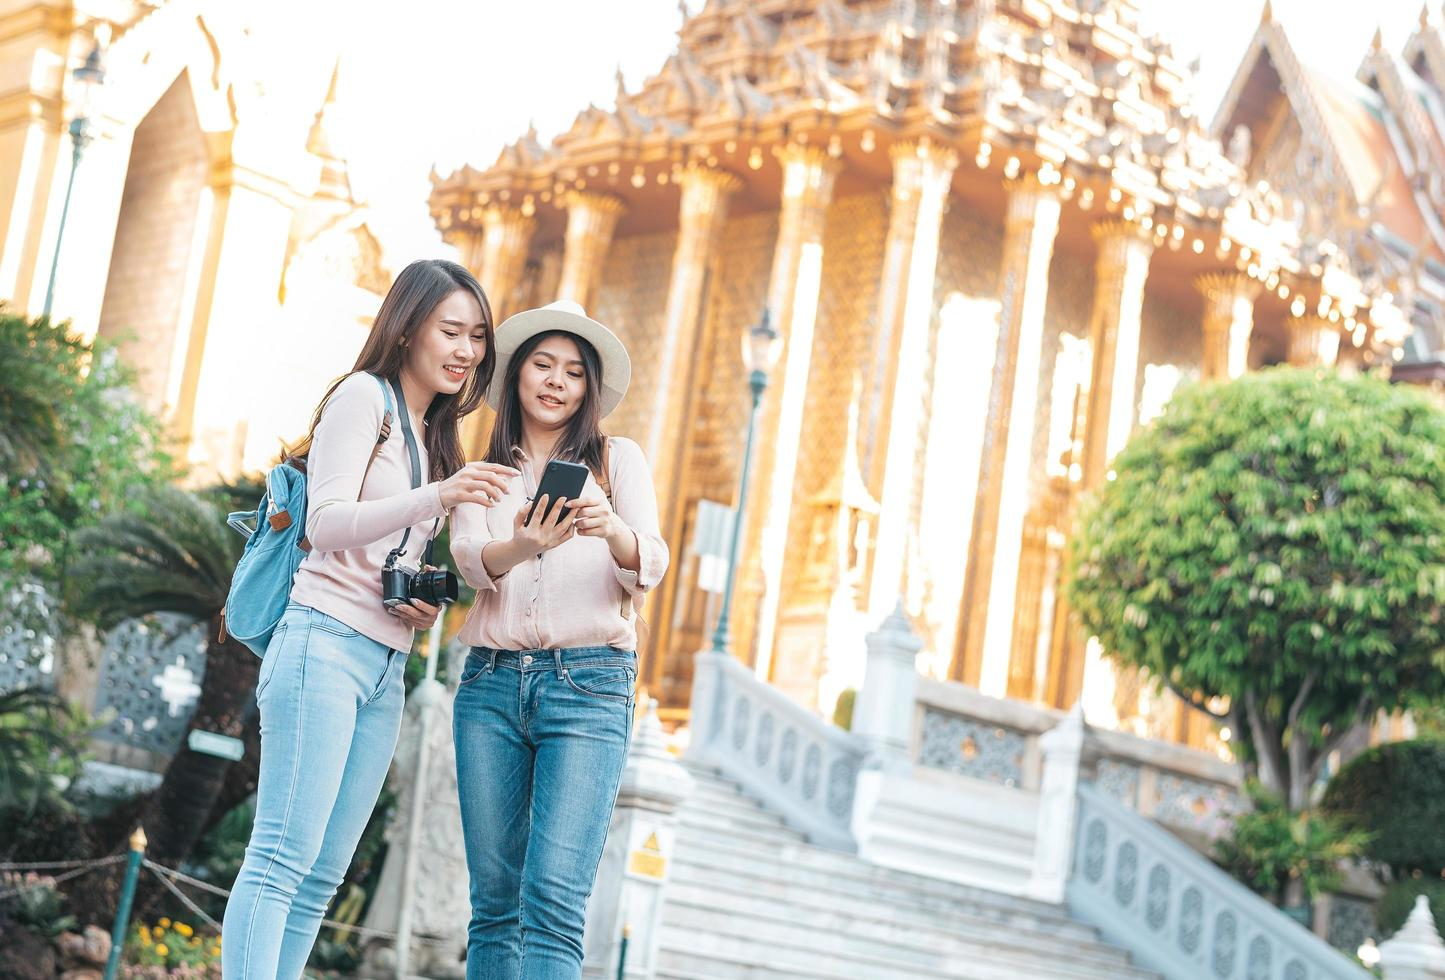 Women tourists taking selfie photo